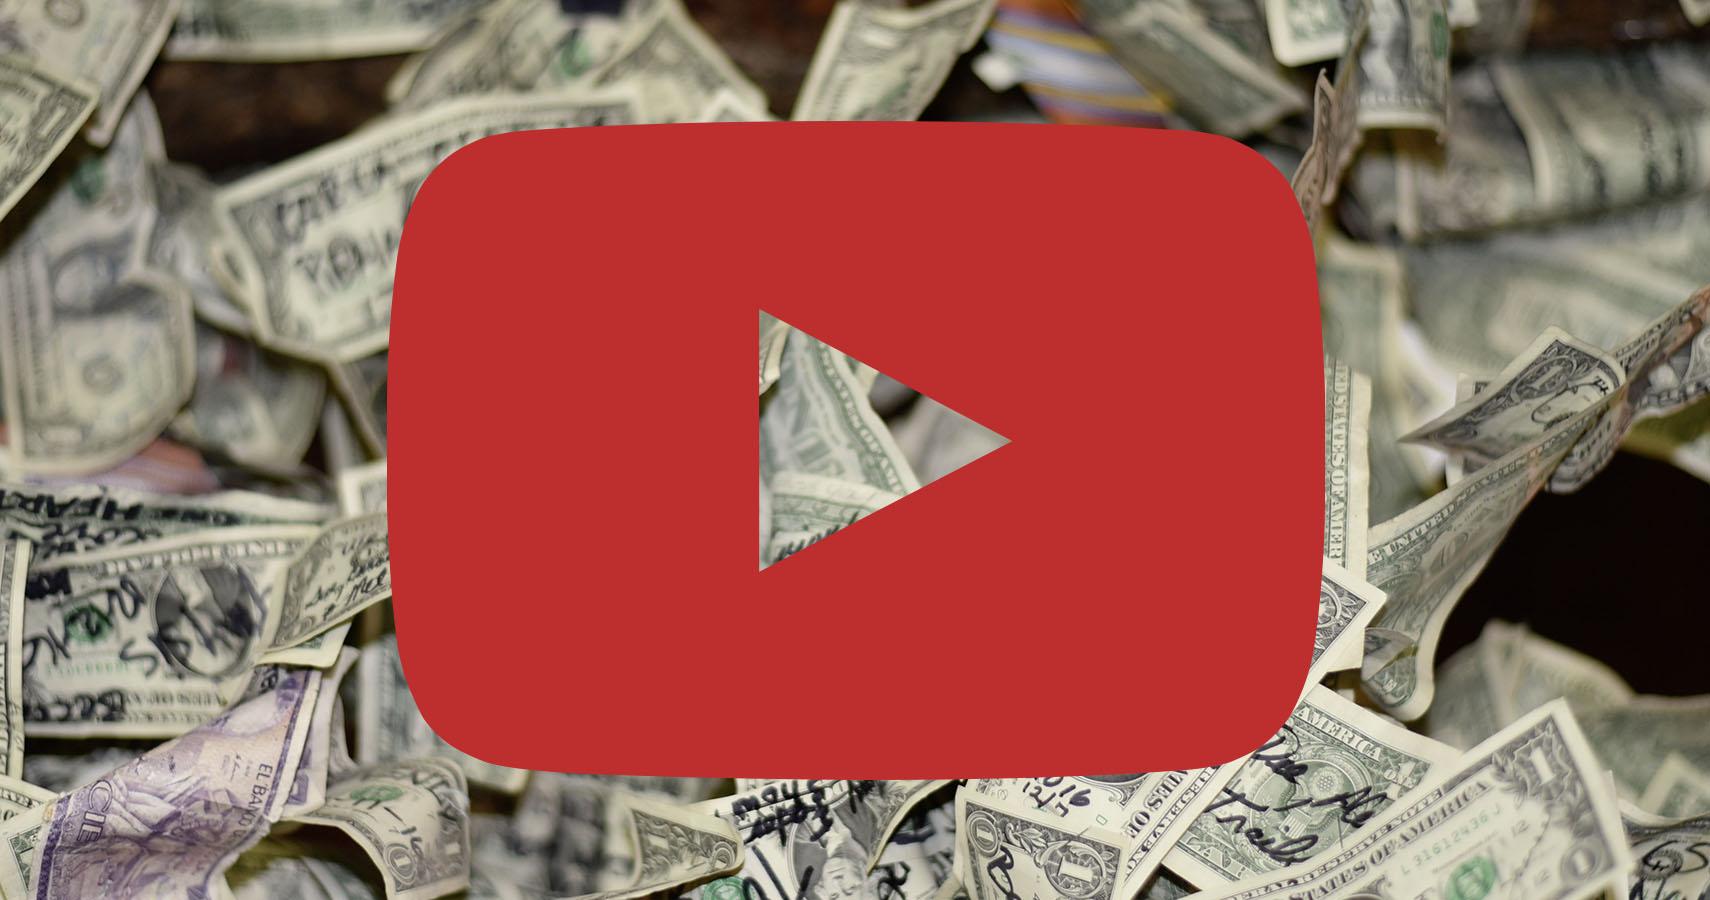 Youtube Monetarisierung